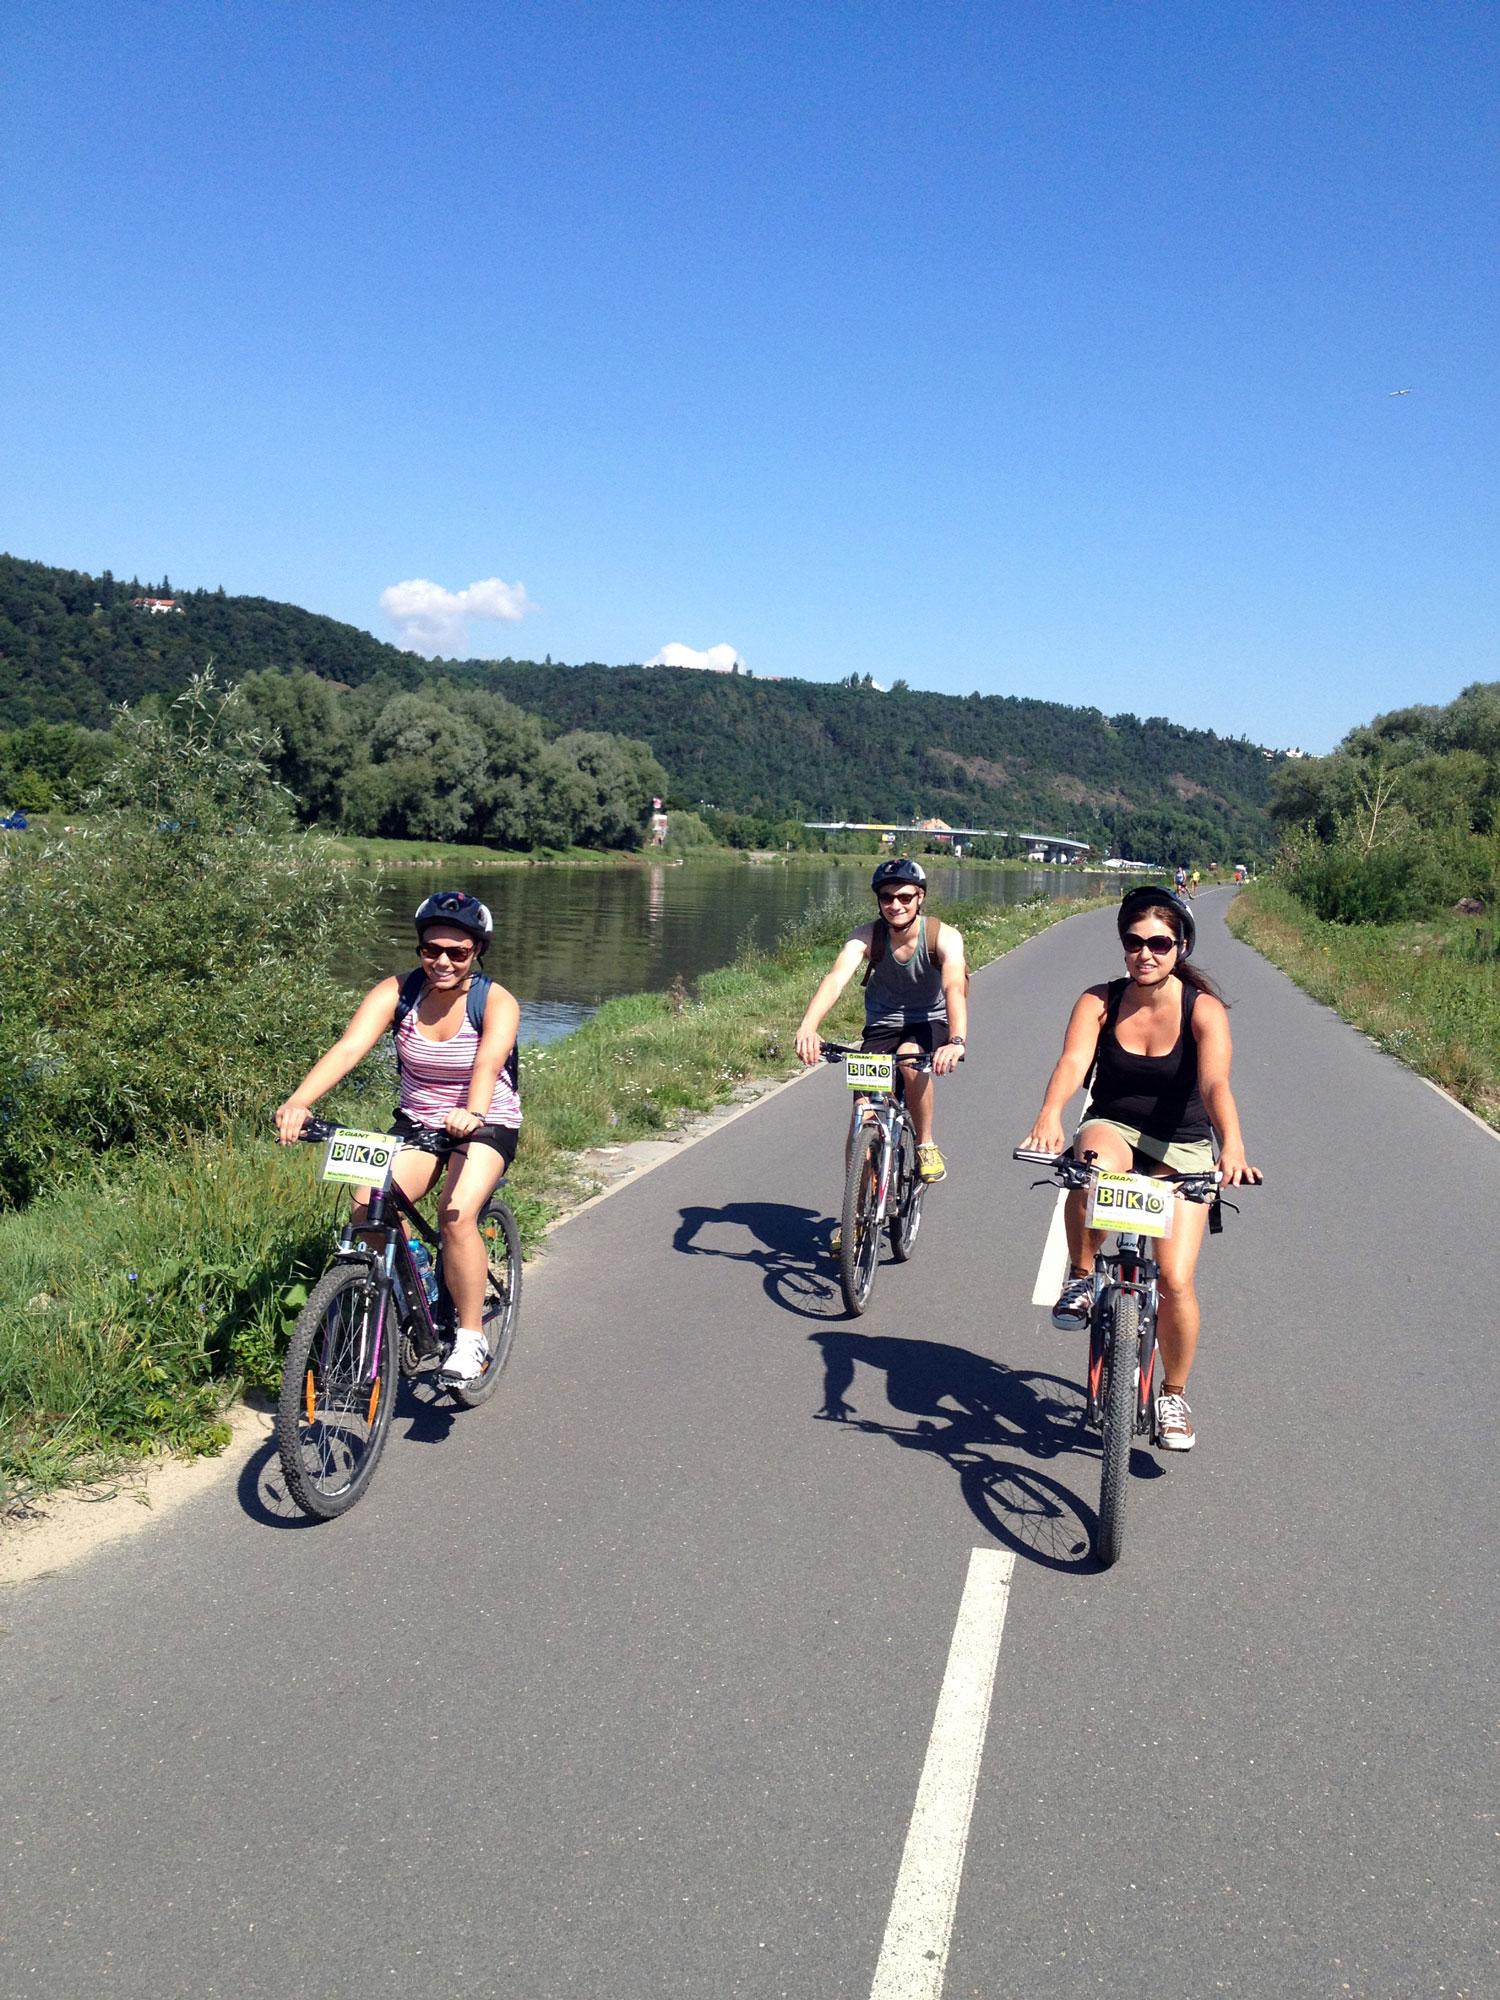 TD Five Boro Bike Tour bans backpacks | Crain's New York Business